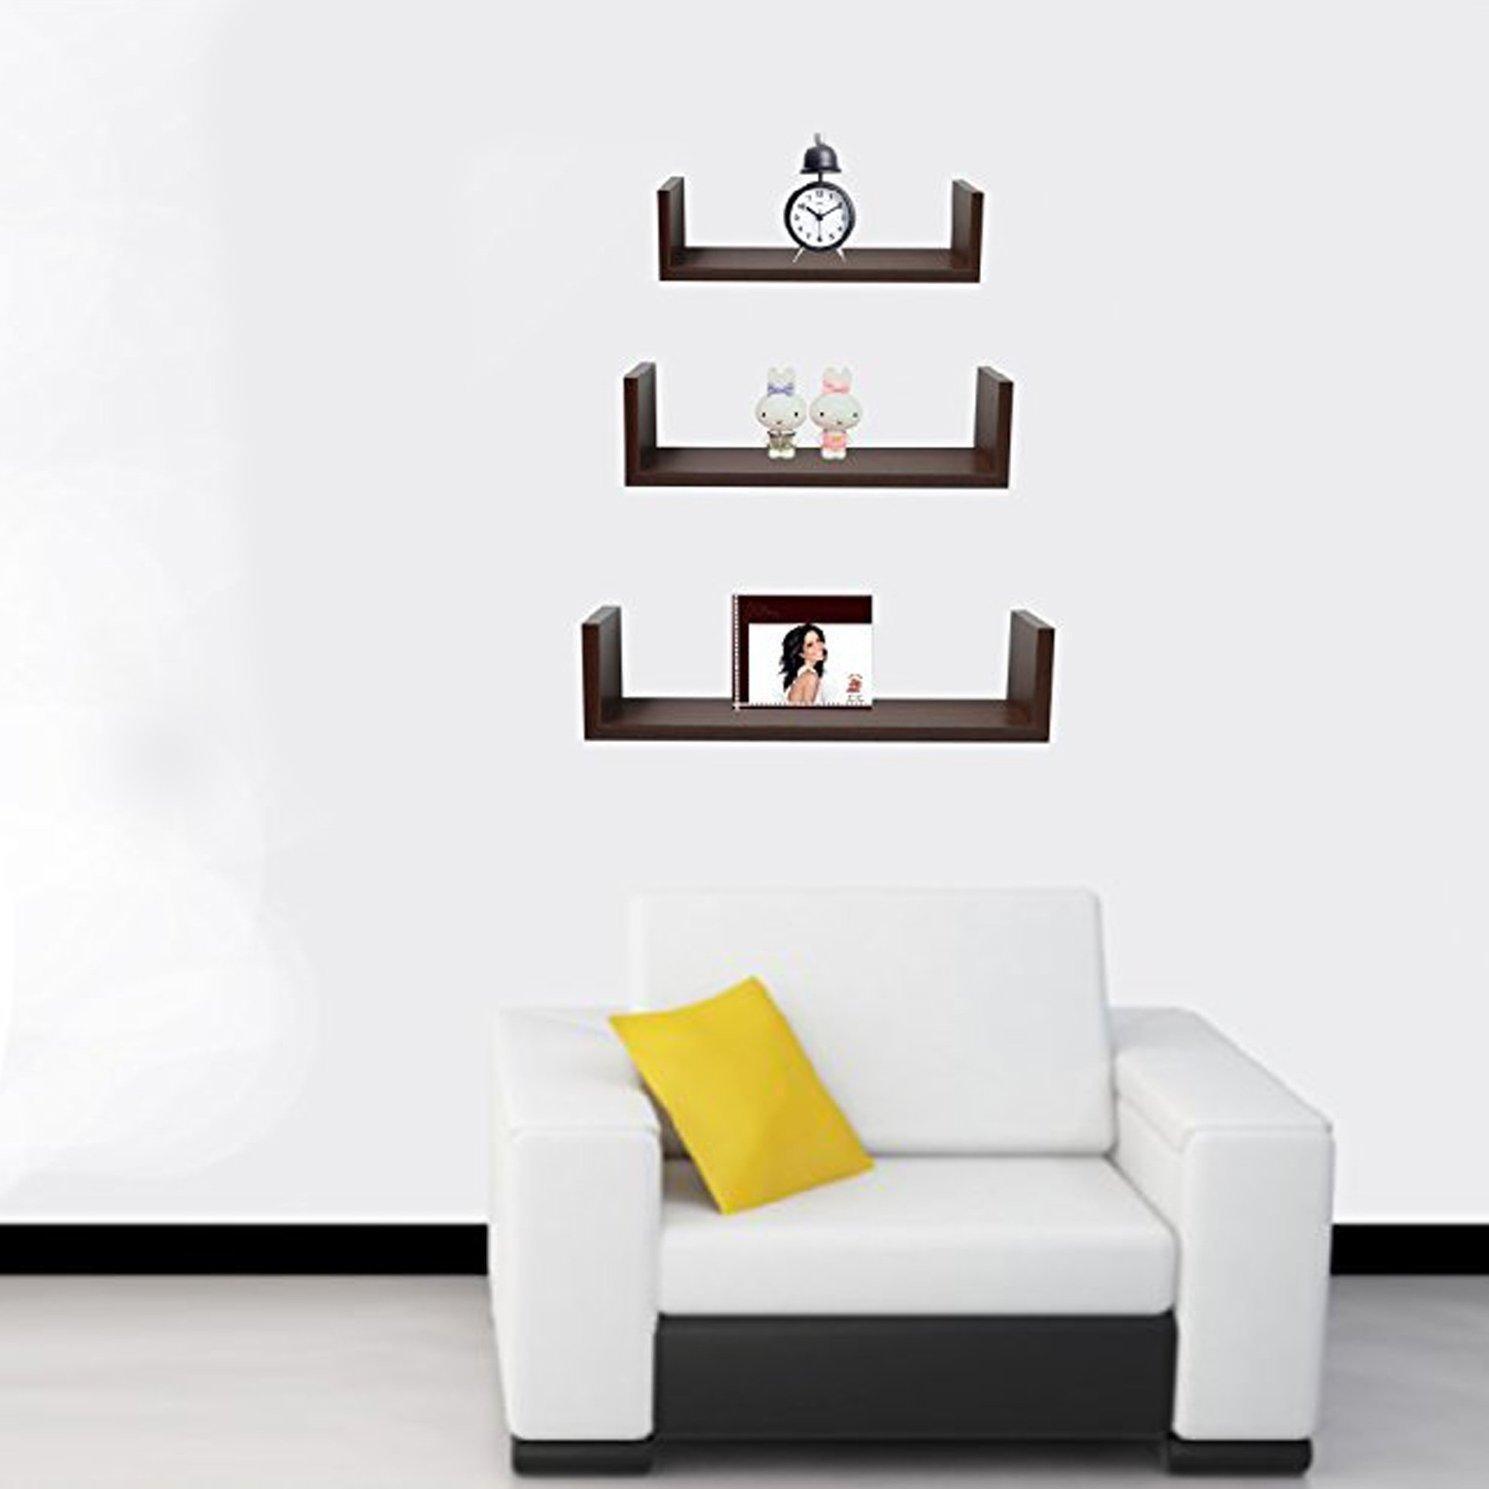 Halter U Shelves